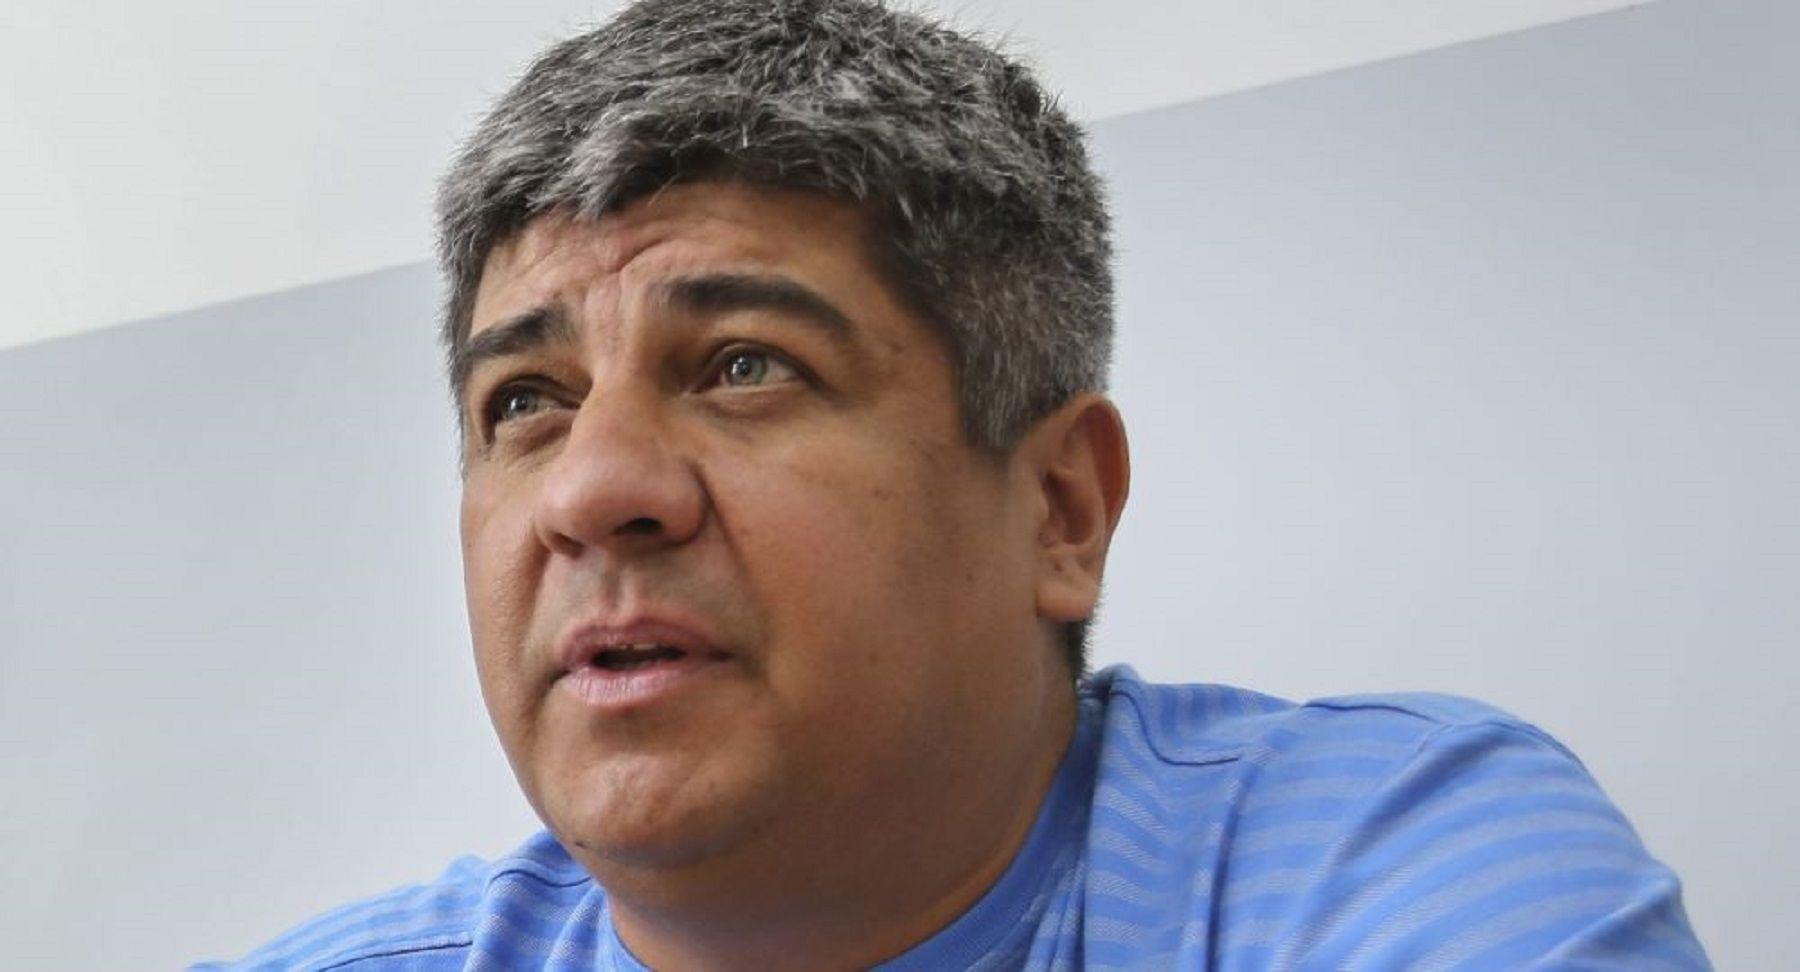 Pablo Moyano le contestó a Carrió: Se va a tener que morder la lengua de víbora que tiene